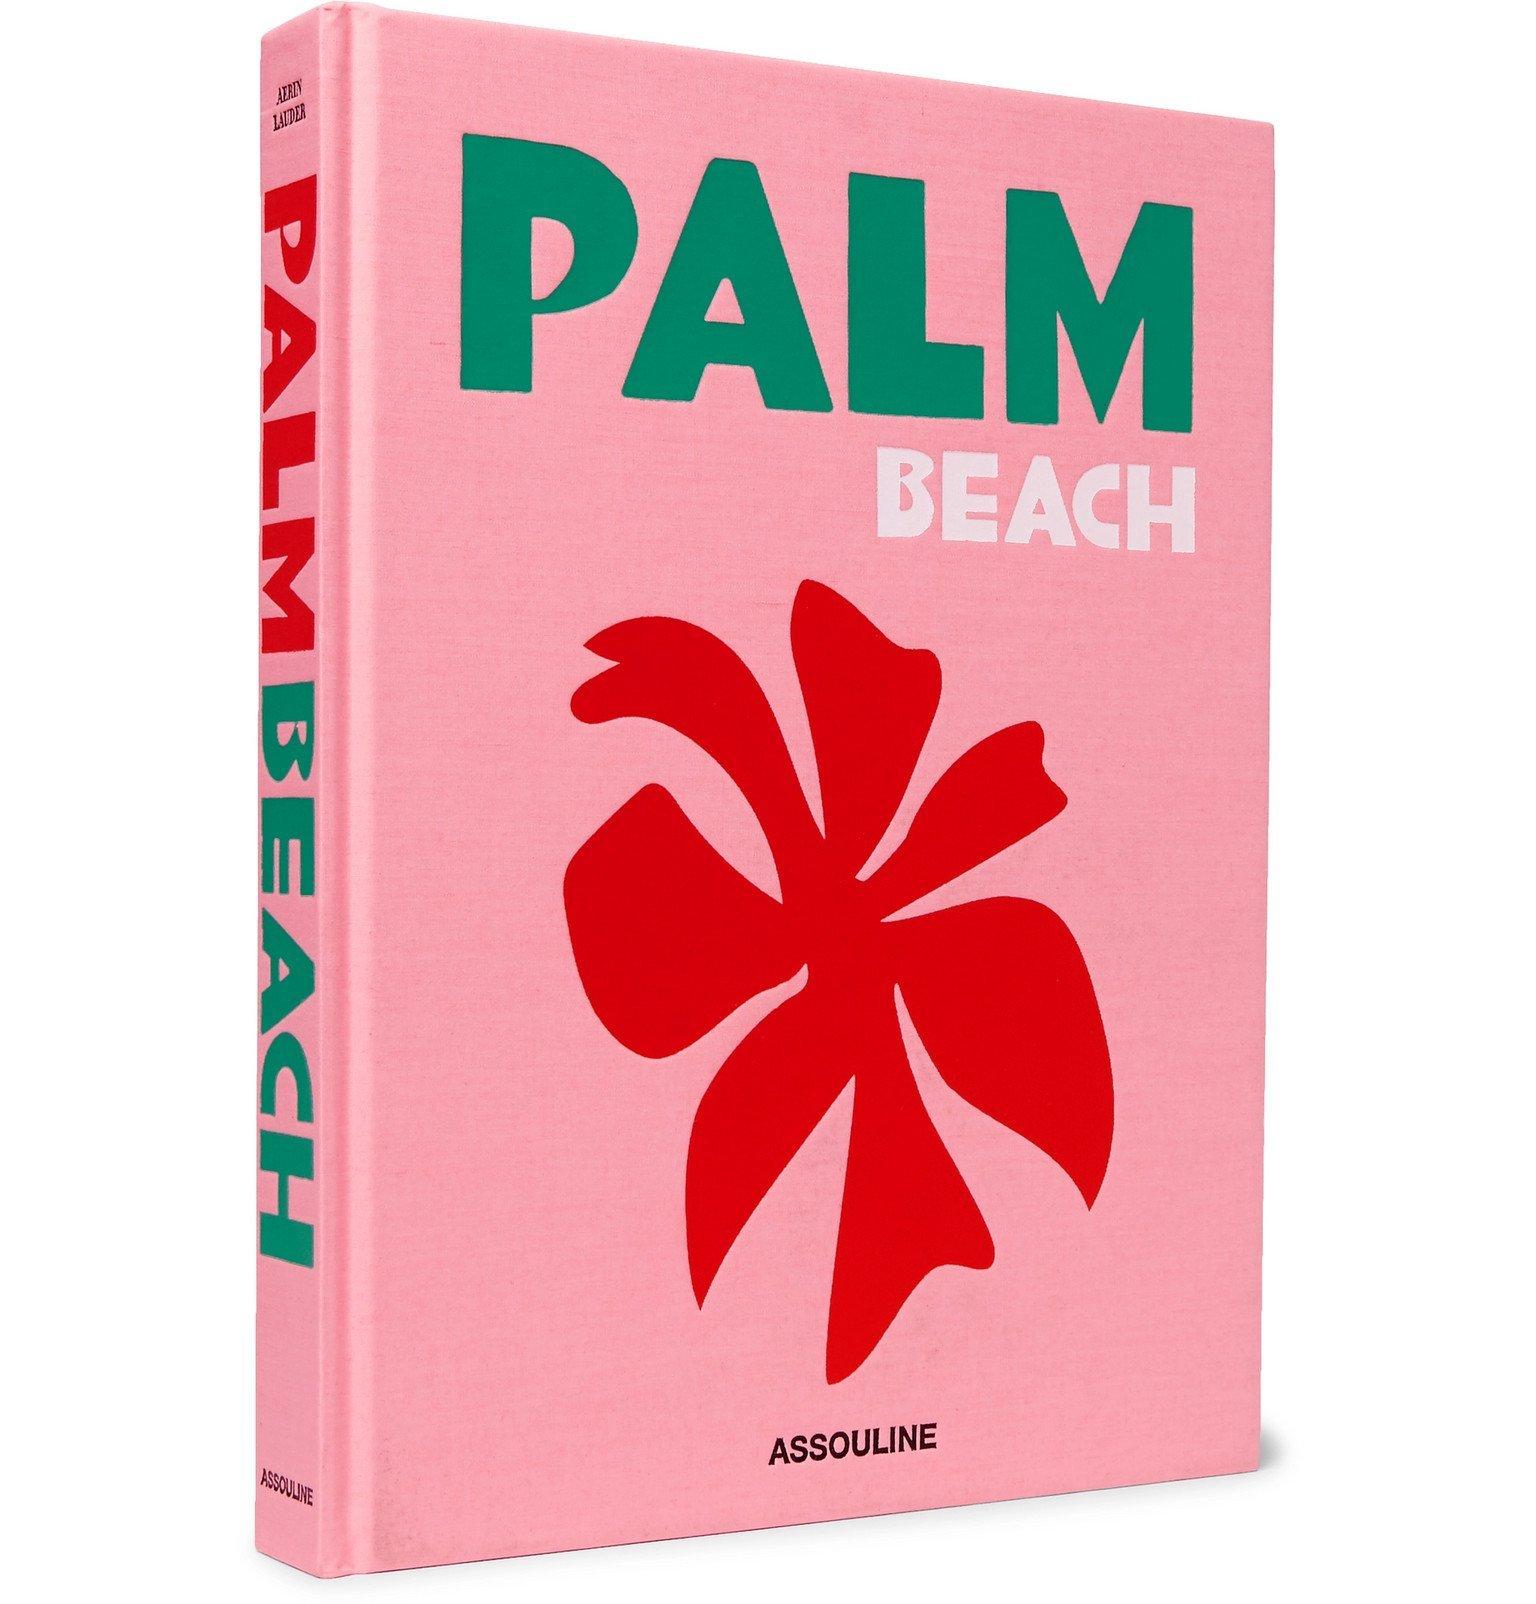 Photo: Assouline - Palm Beach Hardcover Book - Pink